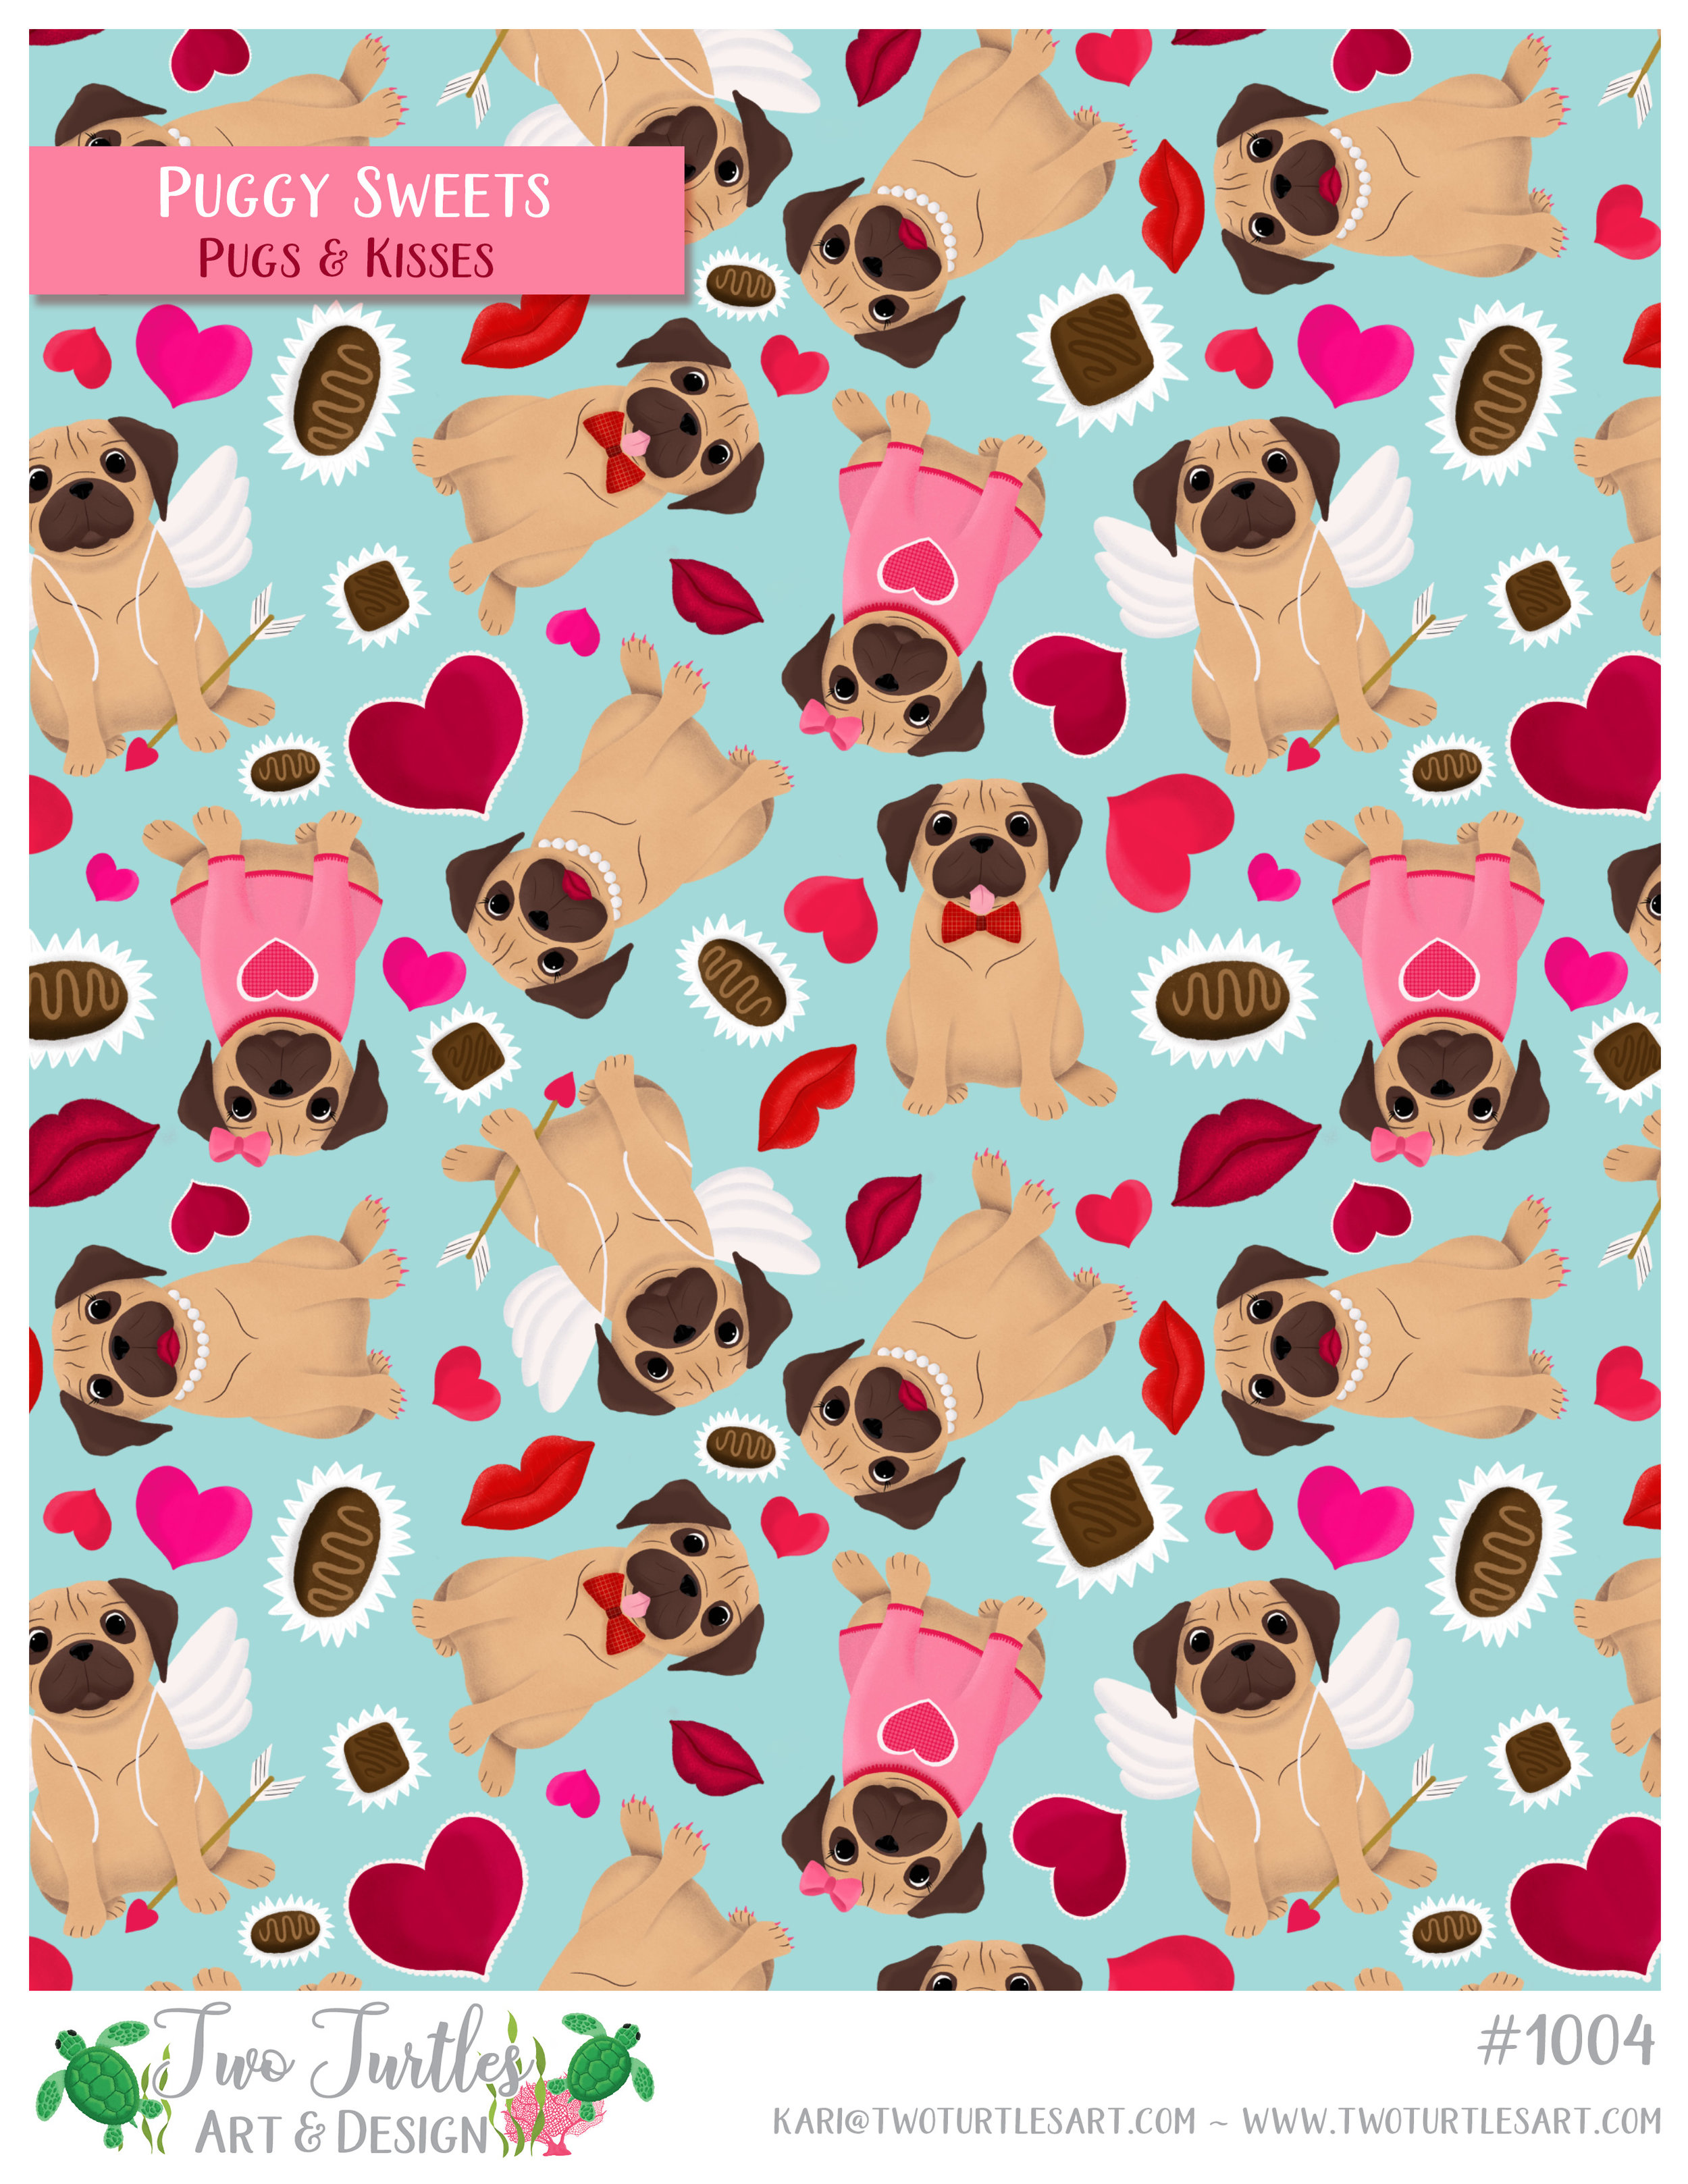 1004-Puggy Sweets.jpg